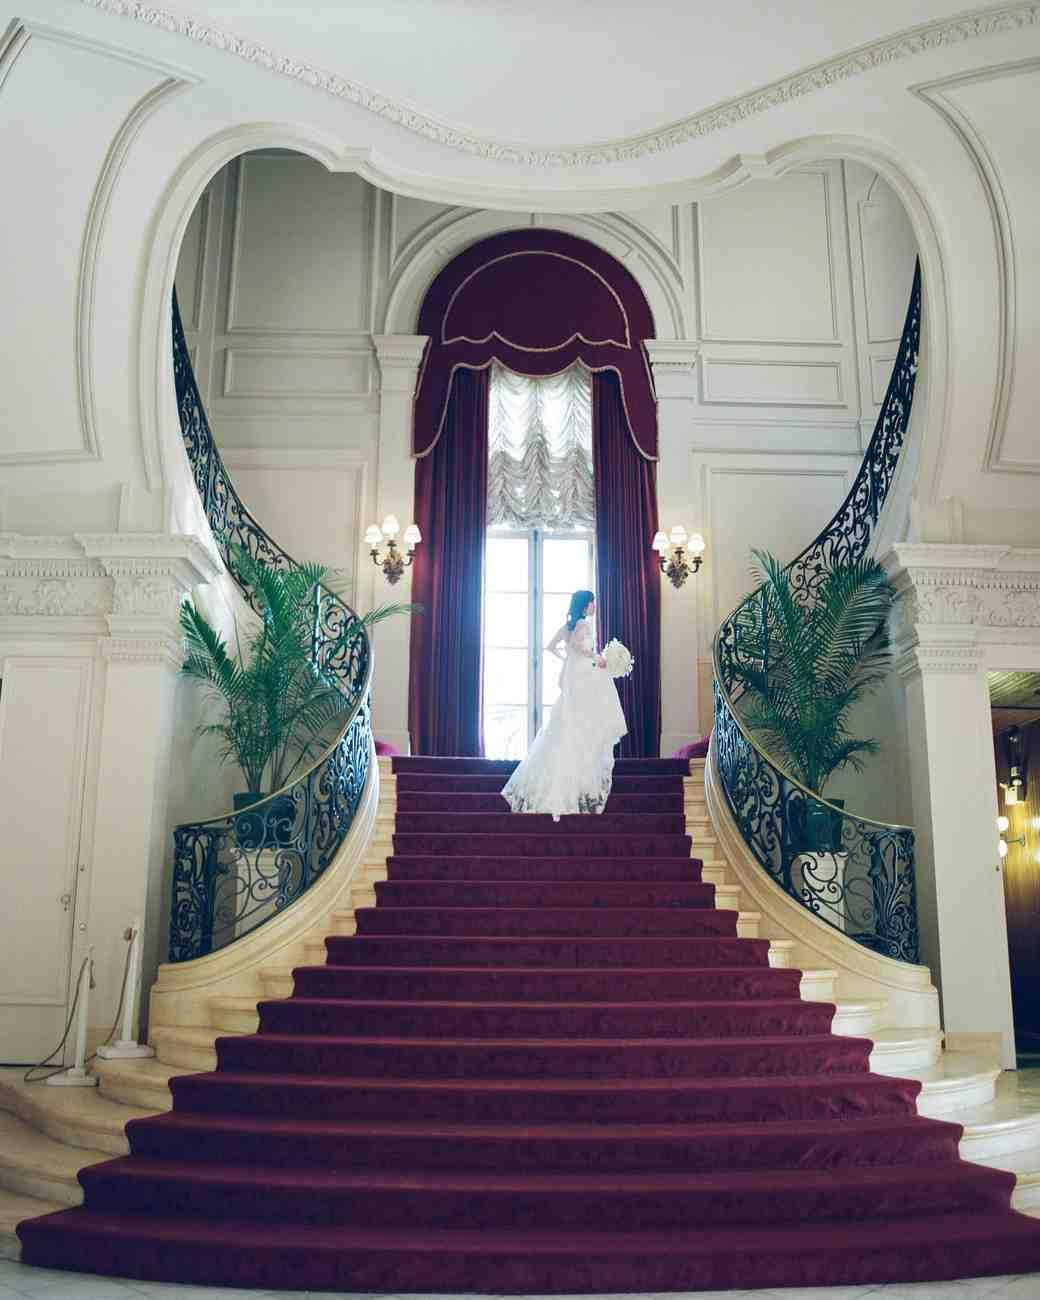 lissy-steven-wedding-newport-bride-stairs-7-elizabethmessina-s112907-0516.jpg